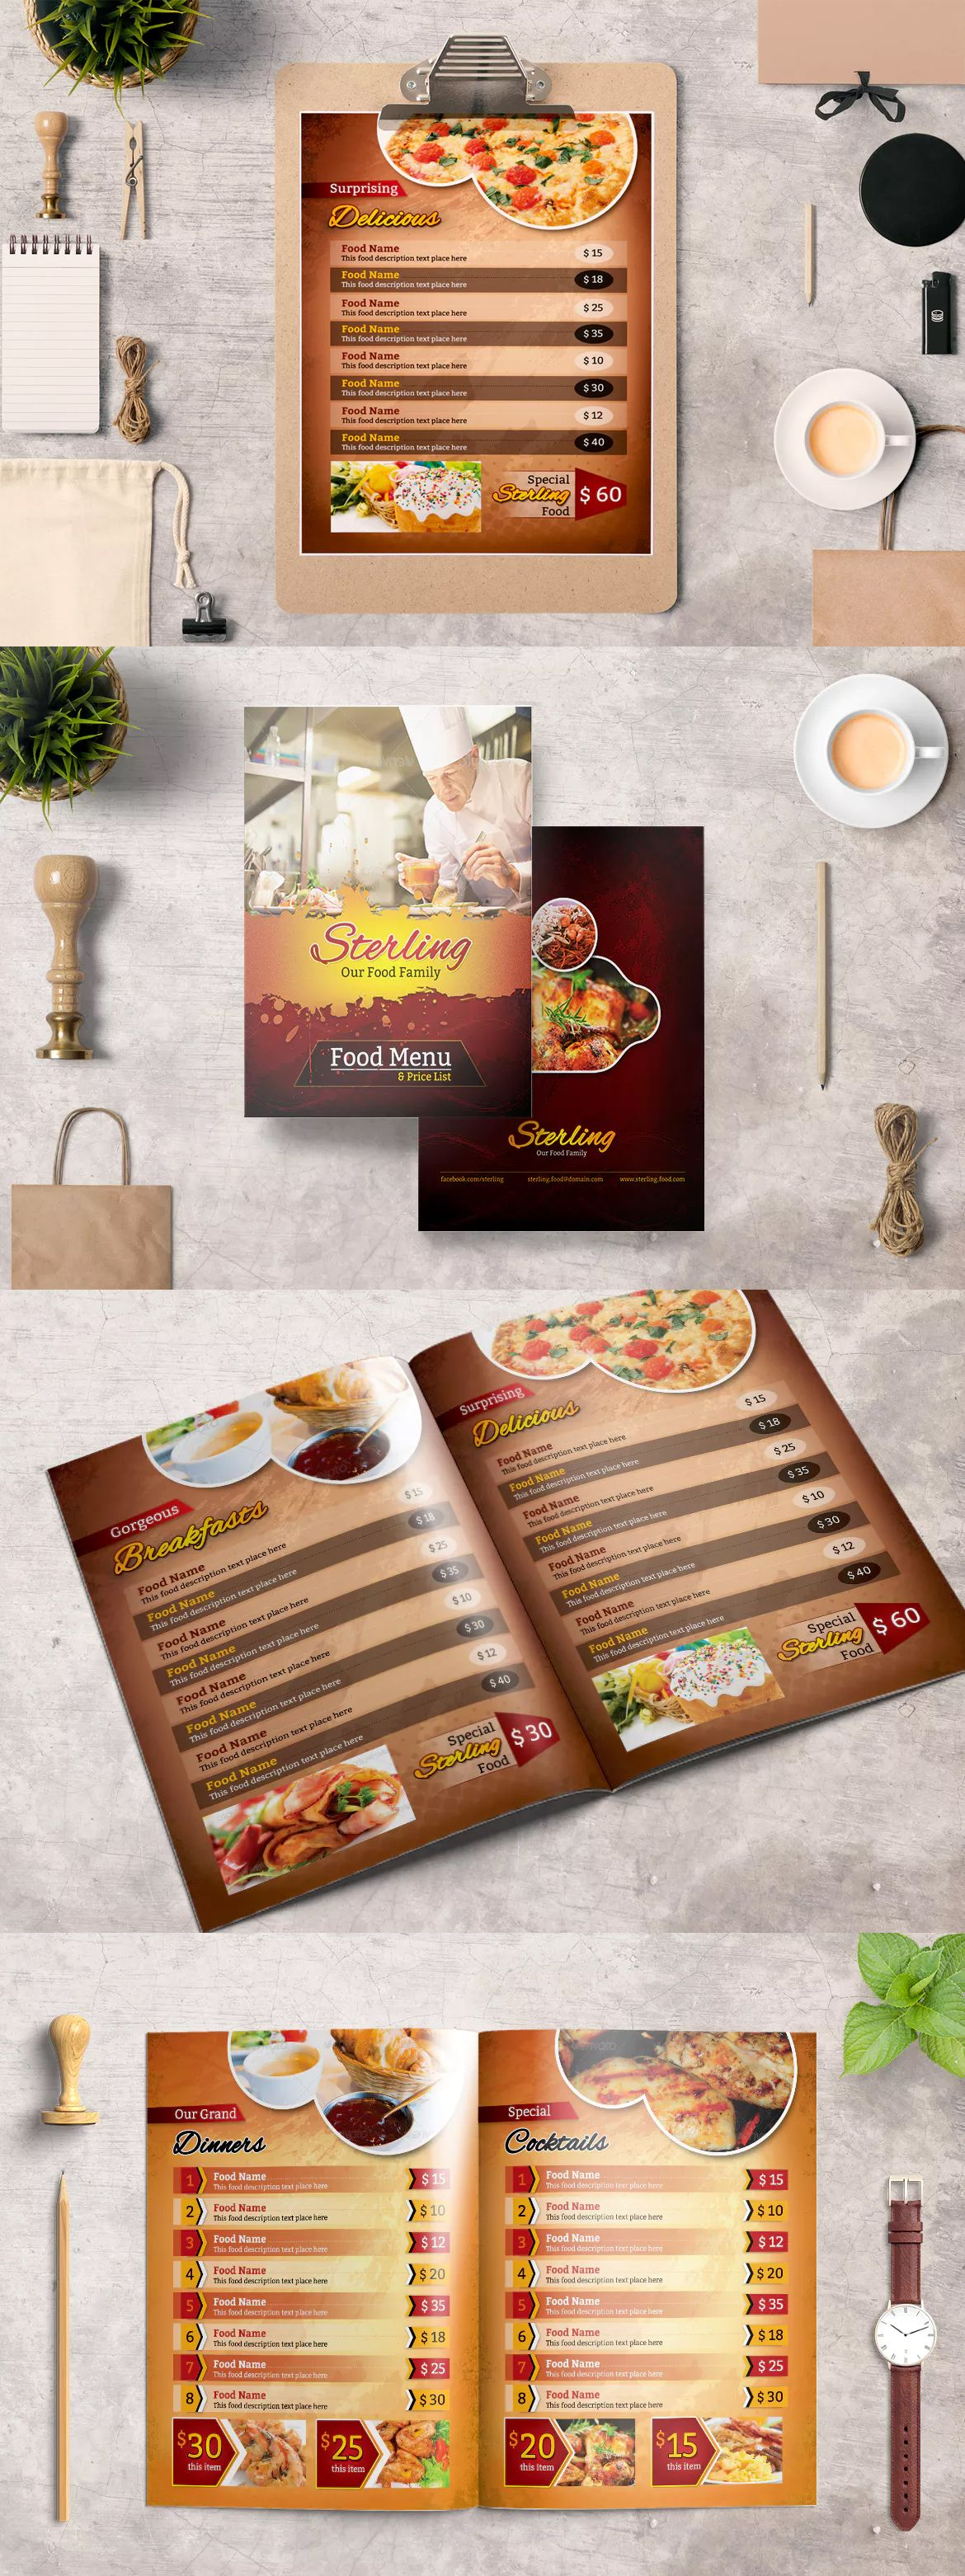 Food Menu Design Taco Bell Menu Template Psd Food Menu Design Food Menu Template Menu Template